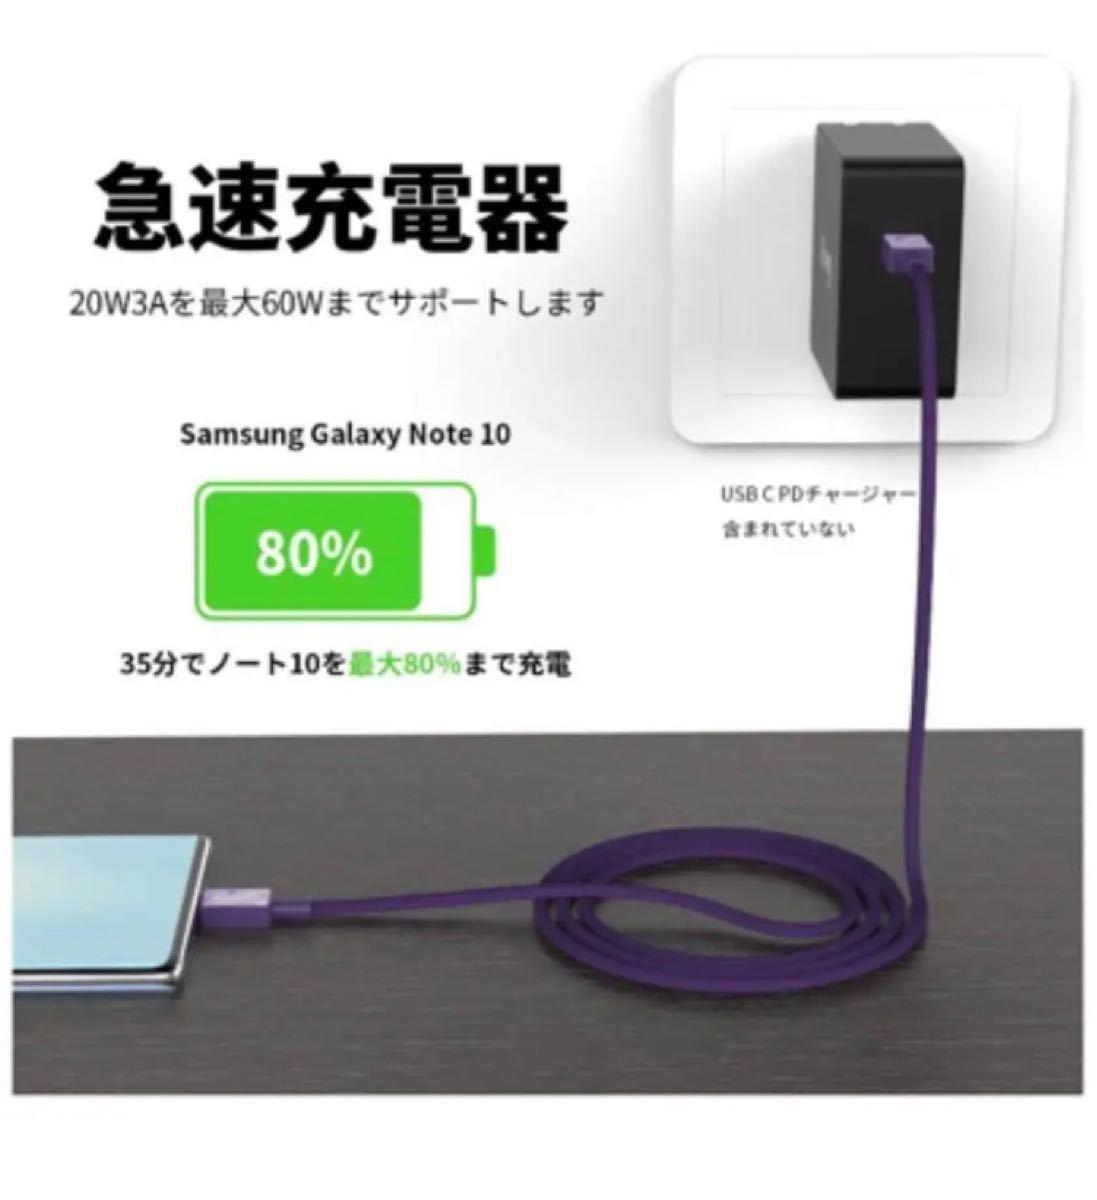 USB C toUSB CナイロンケーブルType-CからTypeC90cm2本